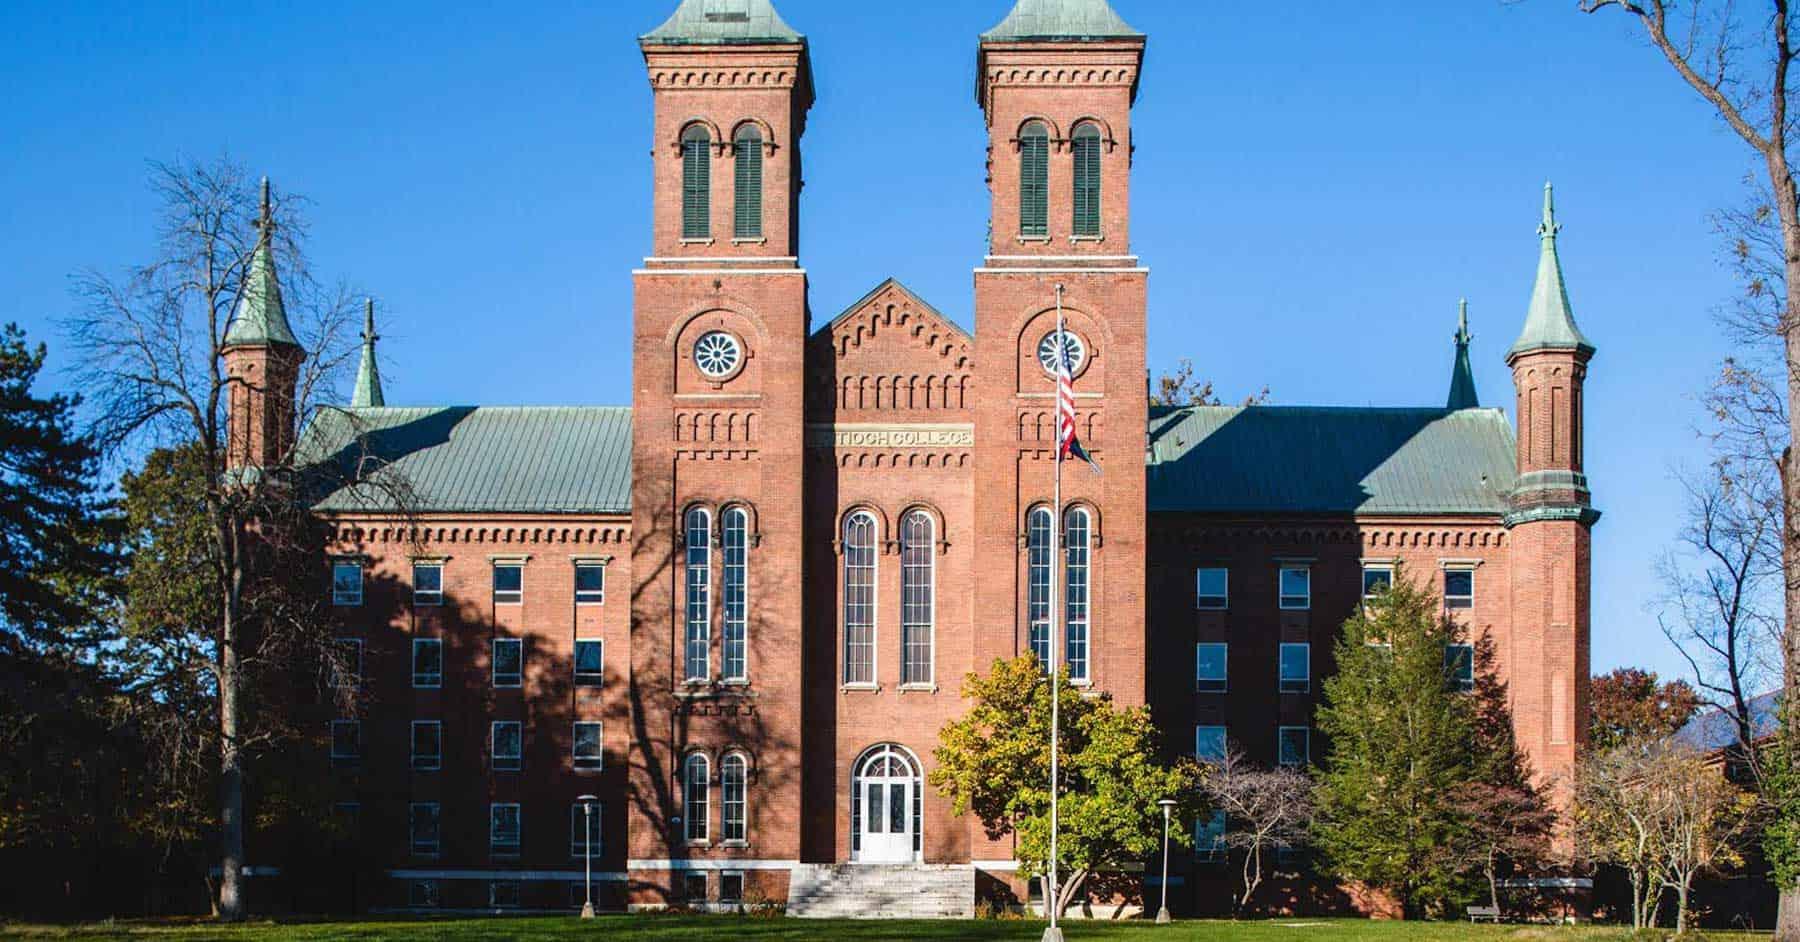 Antioch College